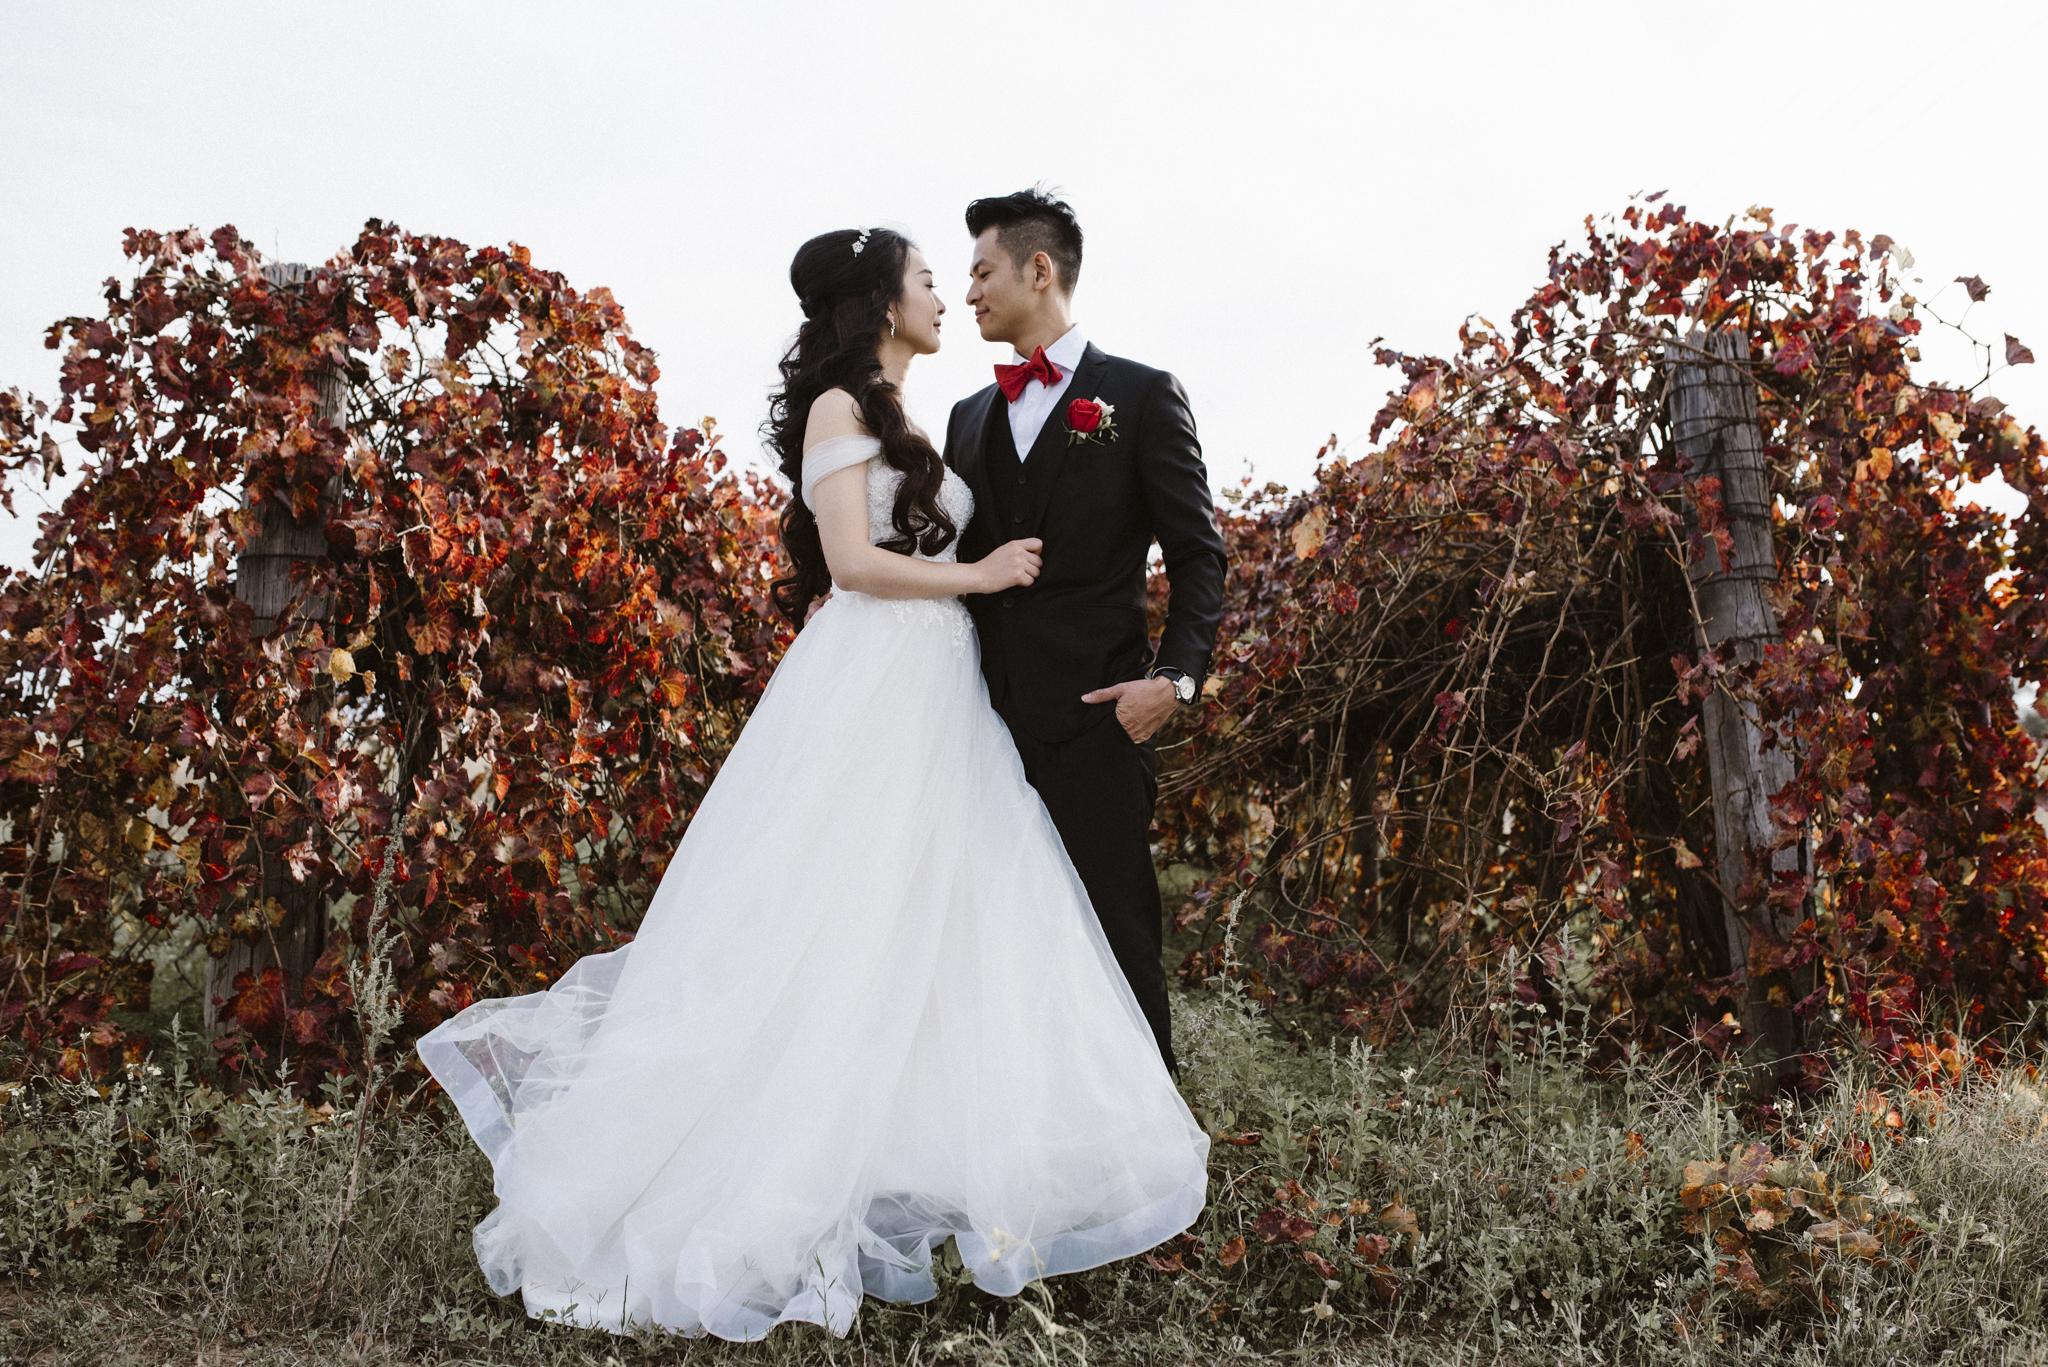 Caversham House and Dragon Palace Wedding - Z and Yanni - 100617 - Perth Wedding Photographer-1059